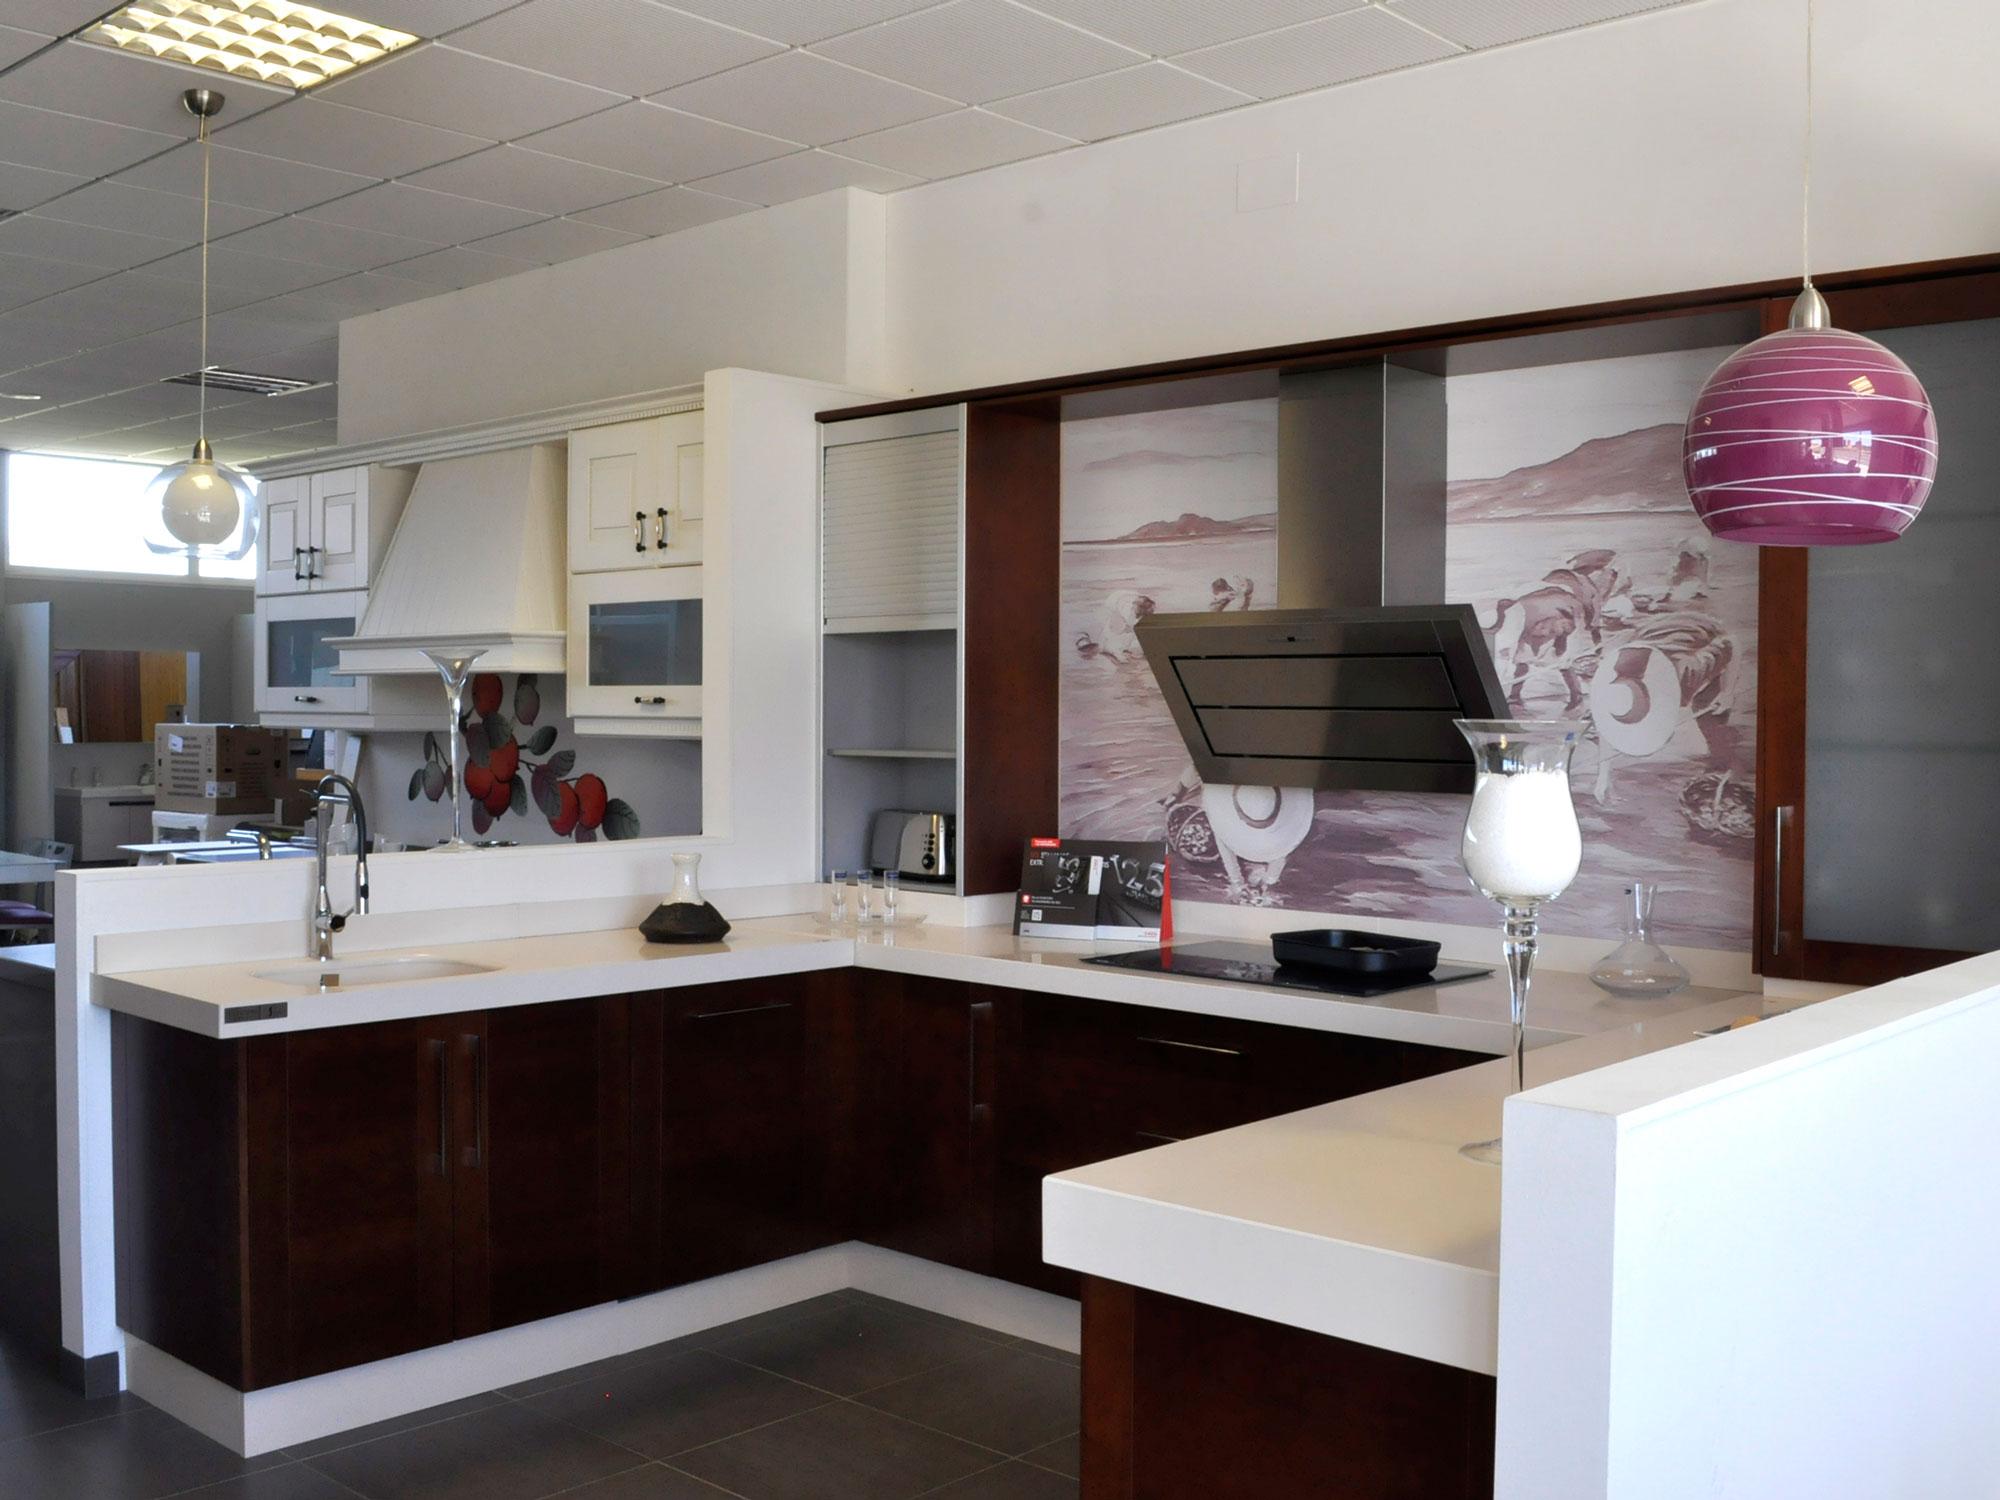 Muebles Bujan Melide - Socios Comercio Asetem Asociaci N Empresarios Terra De Melide[mjhdah]http://asetem.com/wp-content/uploads/2014/01/alimentacion-gomez.jpg